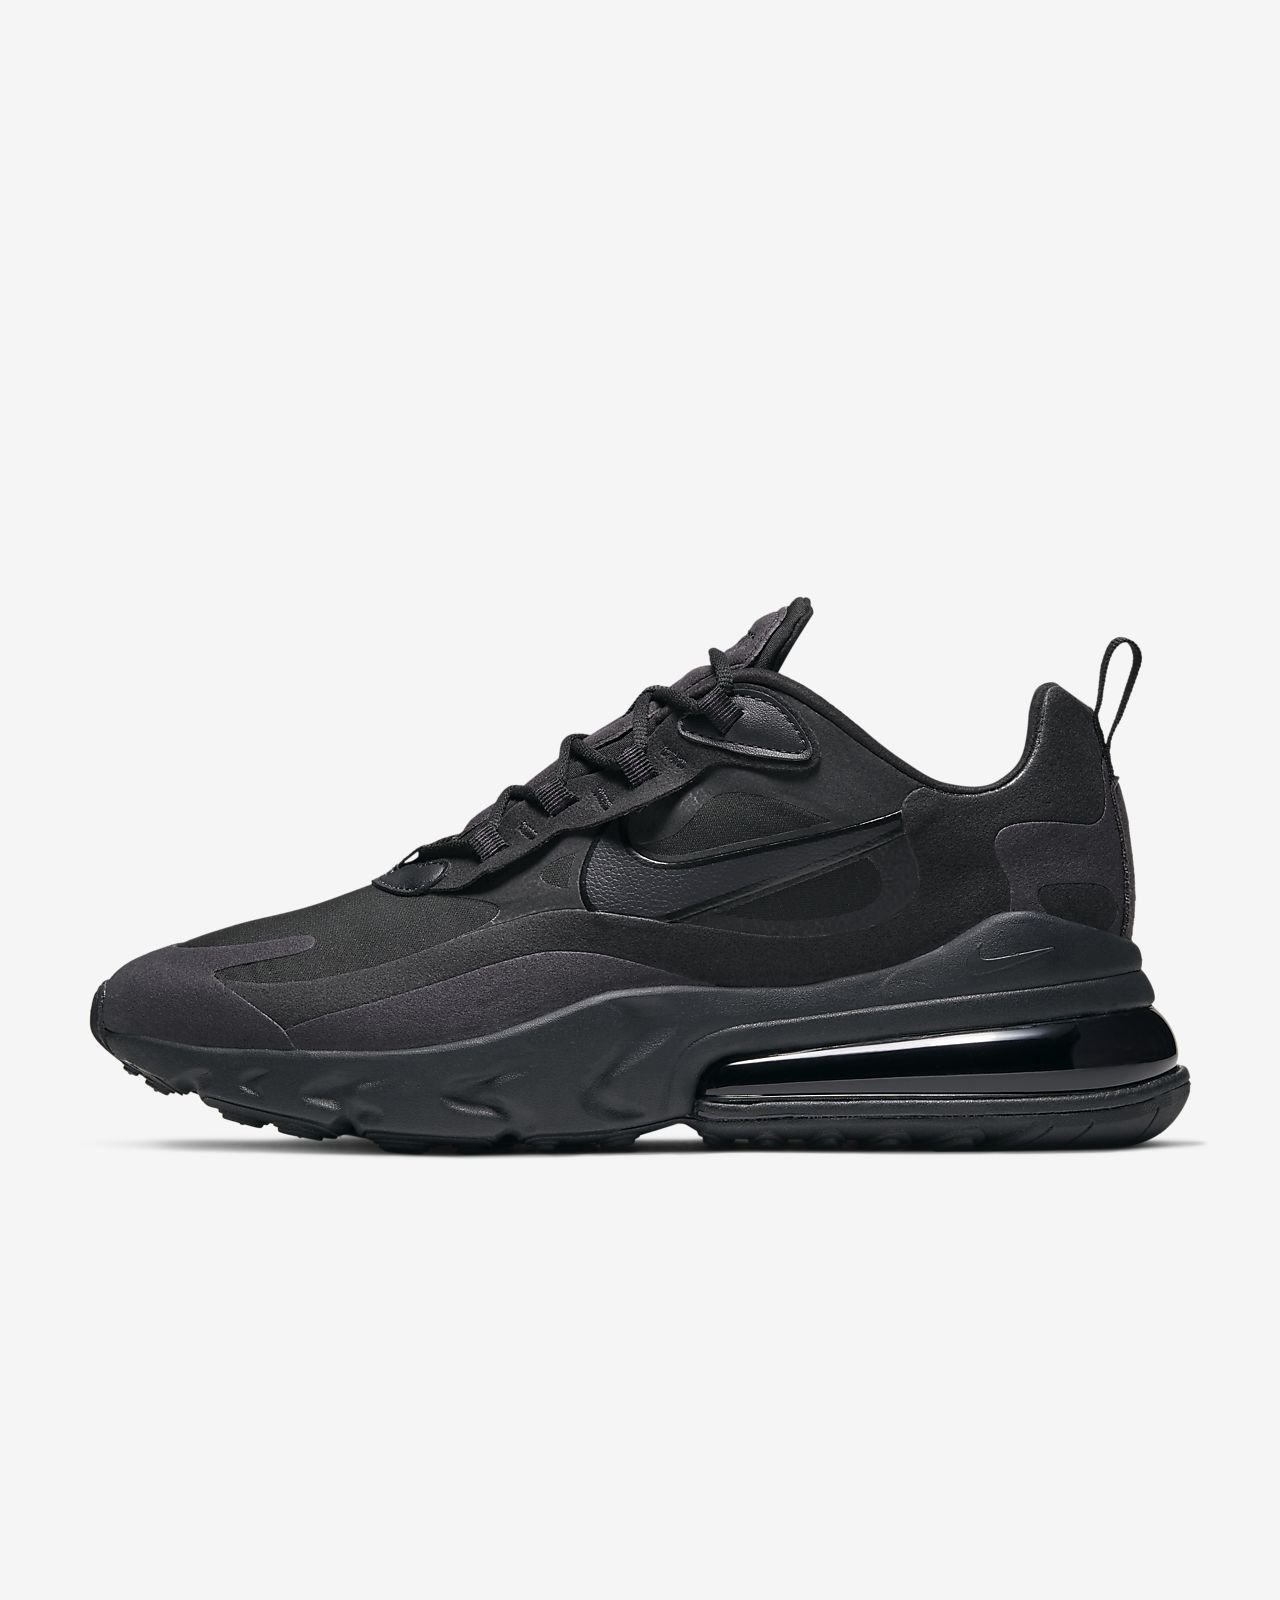 Nike Air Max 270 React (Hip Hop) Men's Shoes